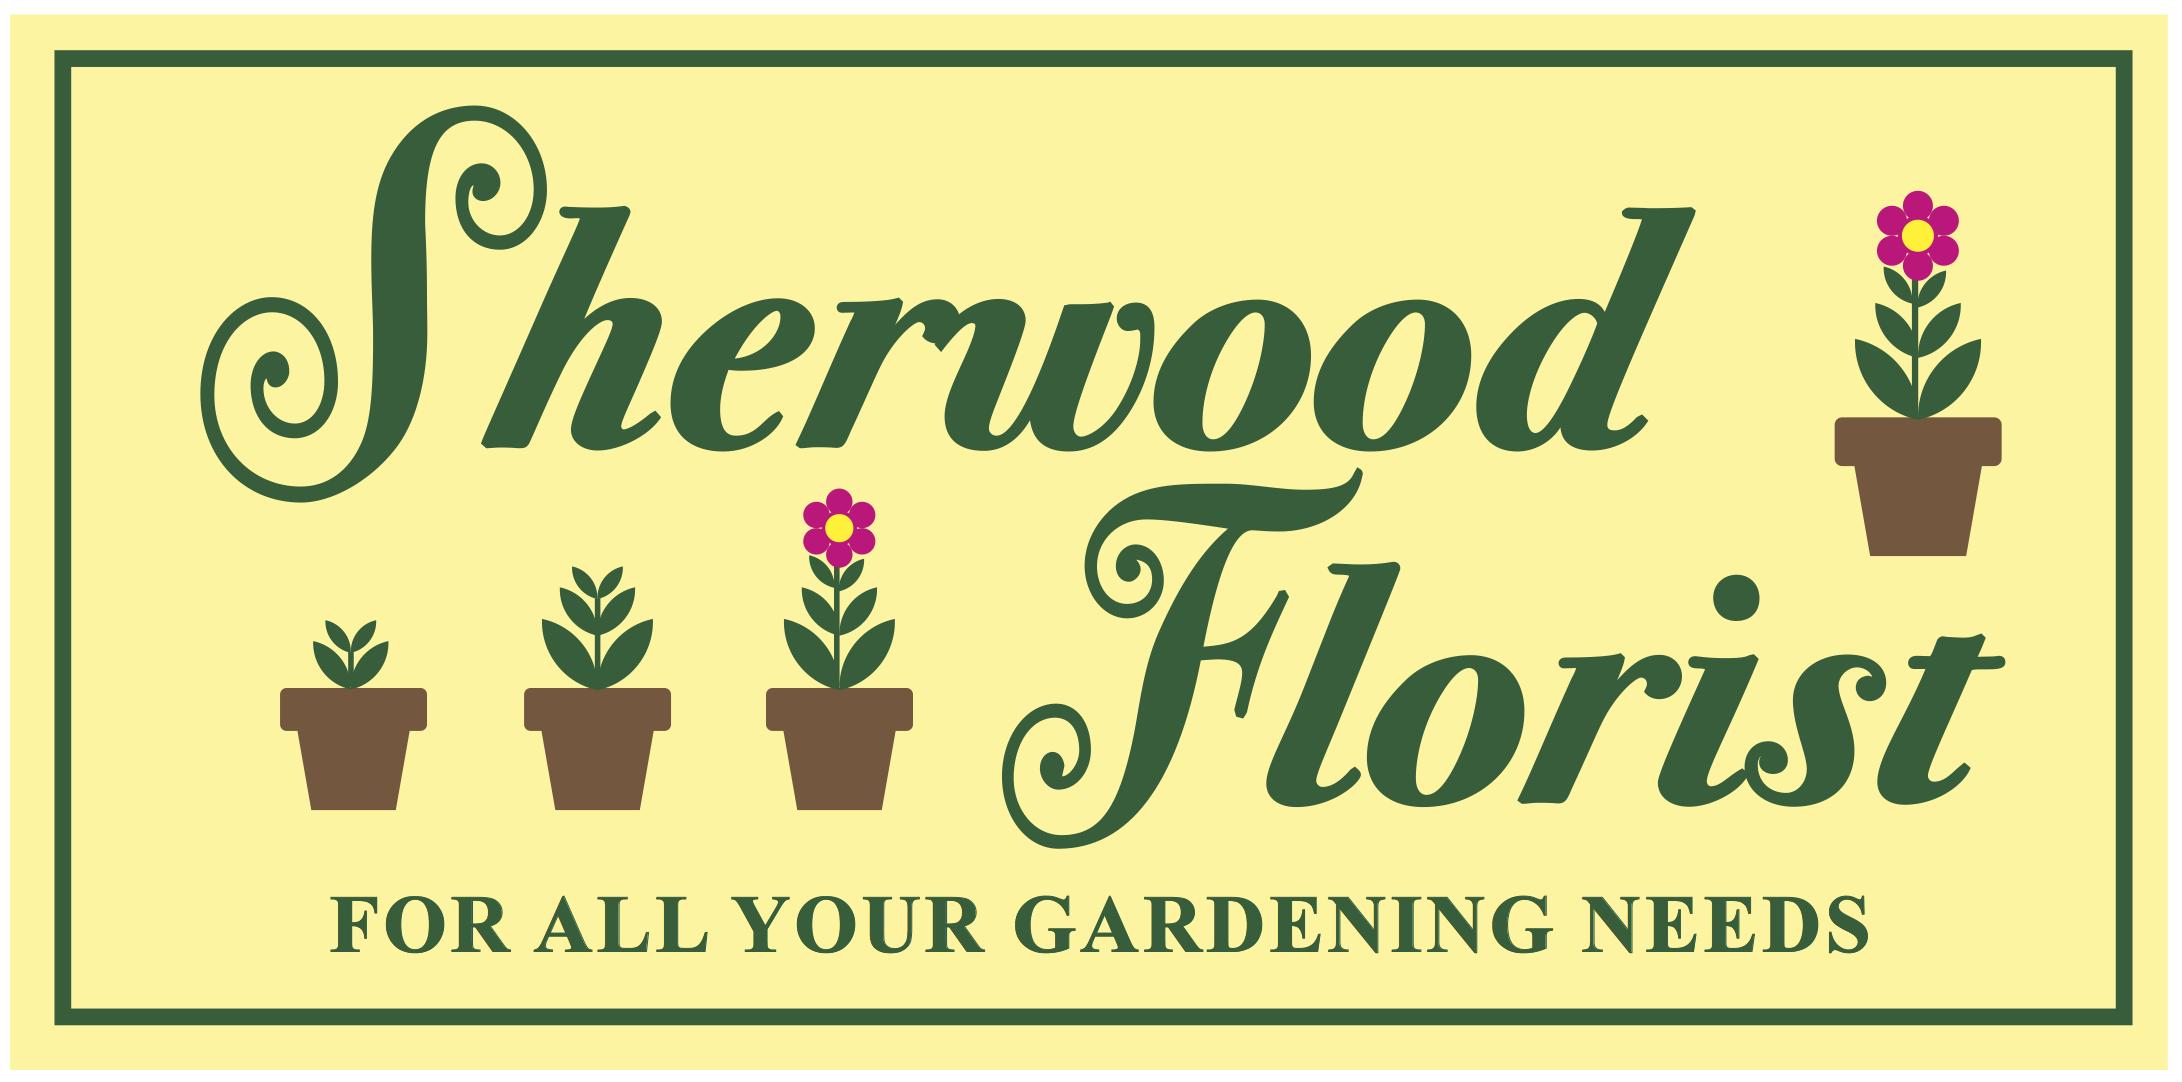 SHERWOOD FLORIST REVISED copy.jpg